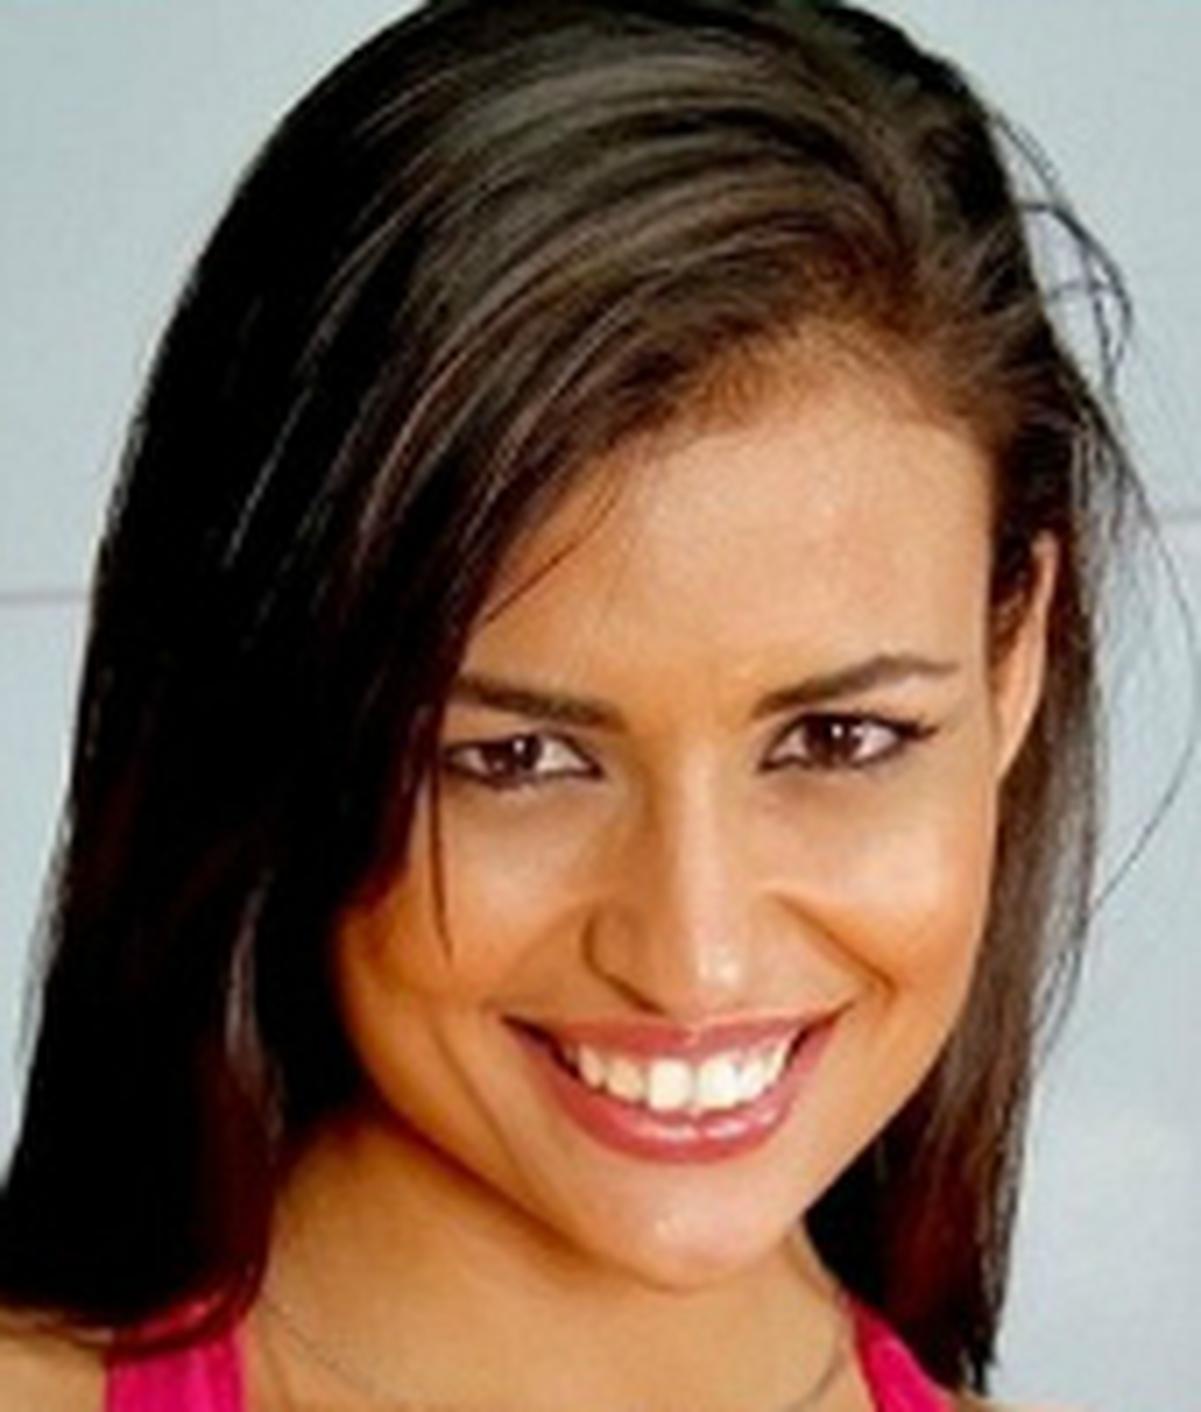 Kamilla Werneck